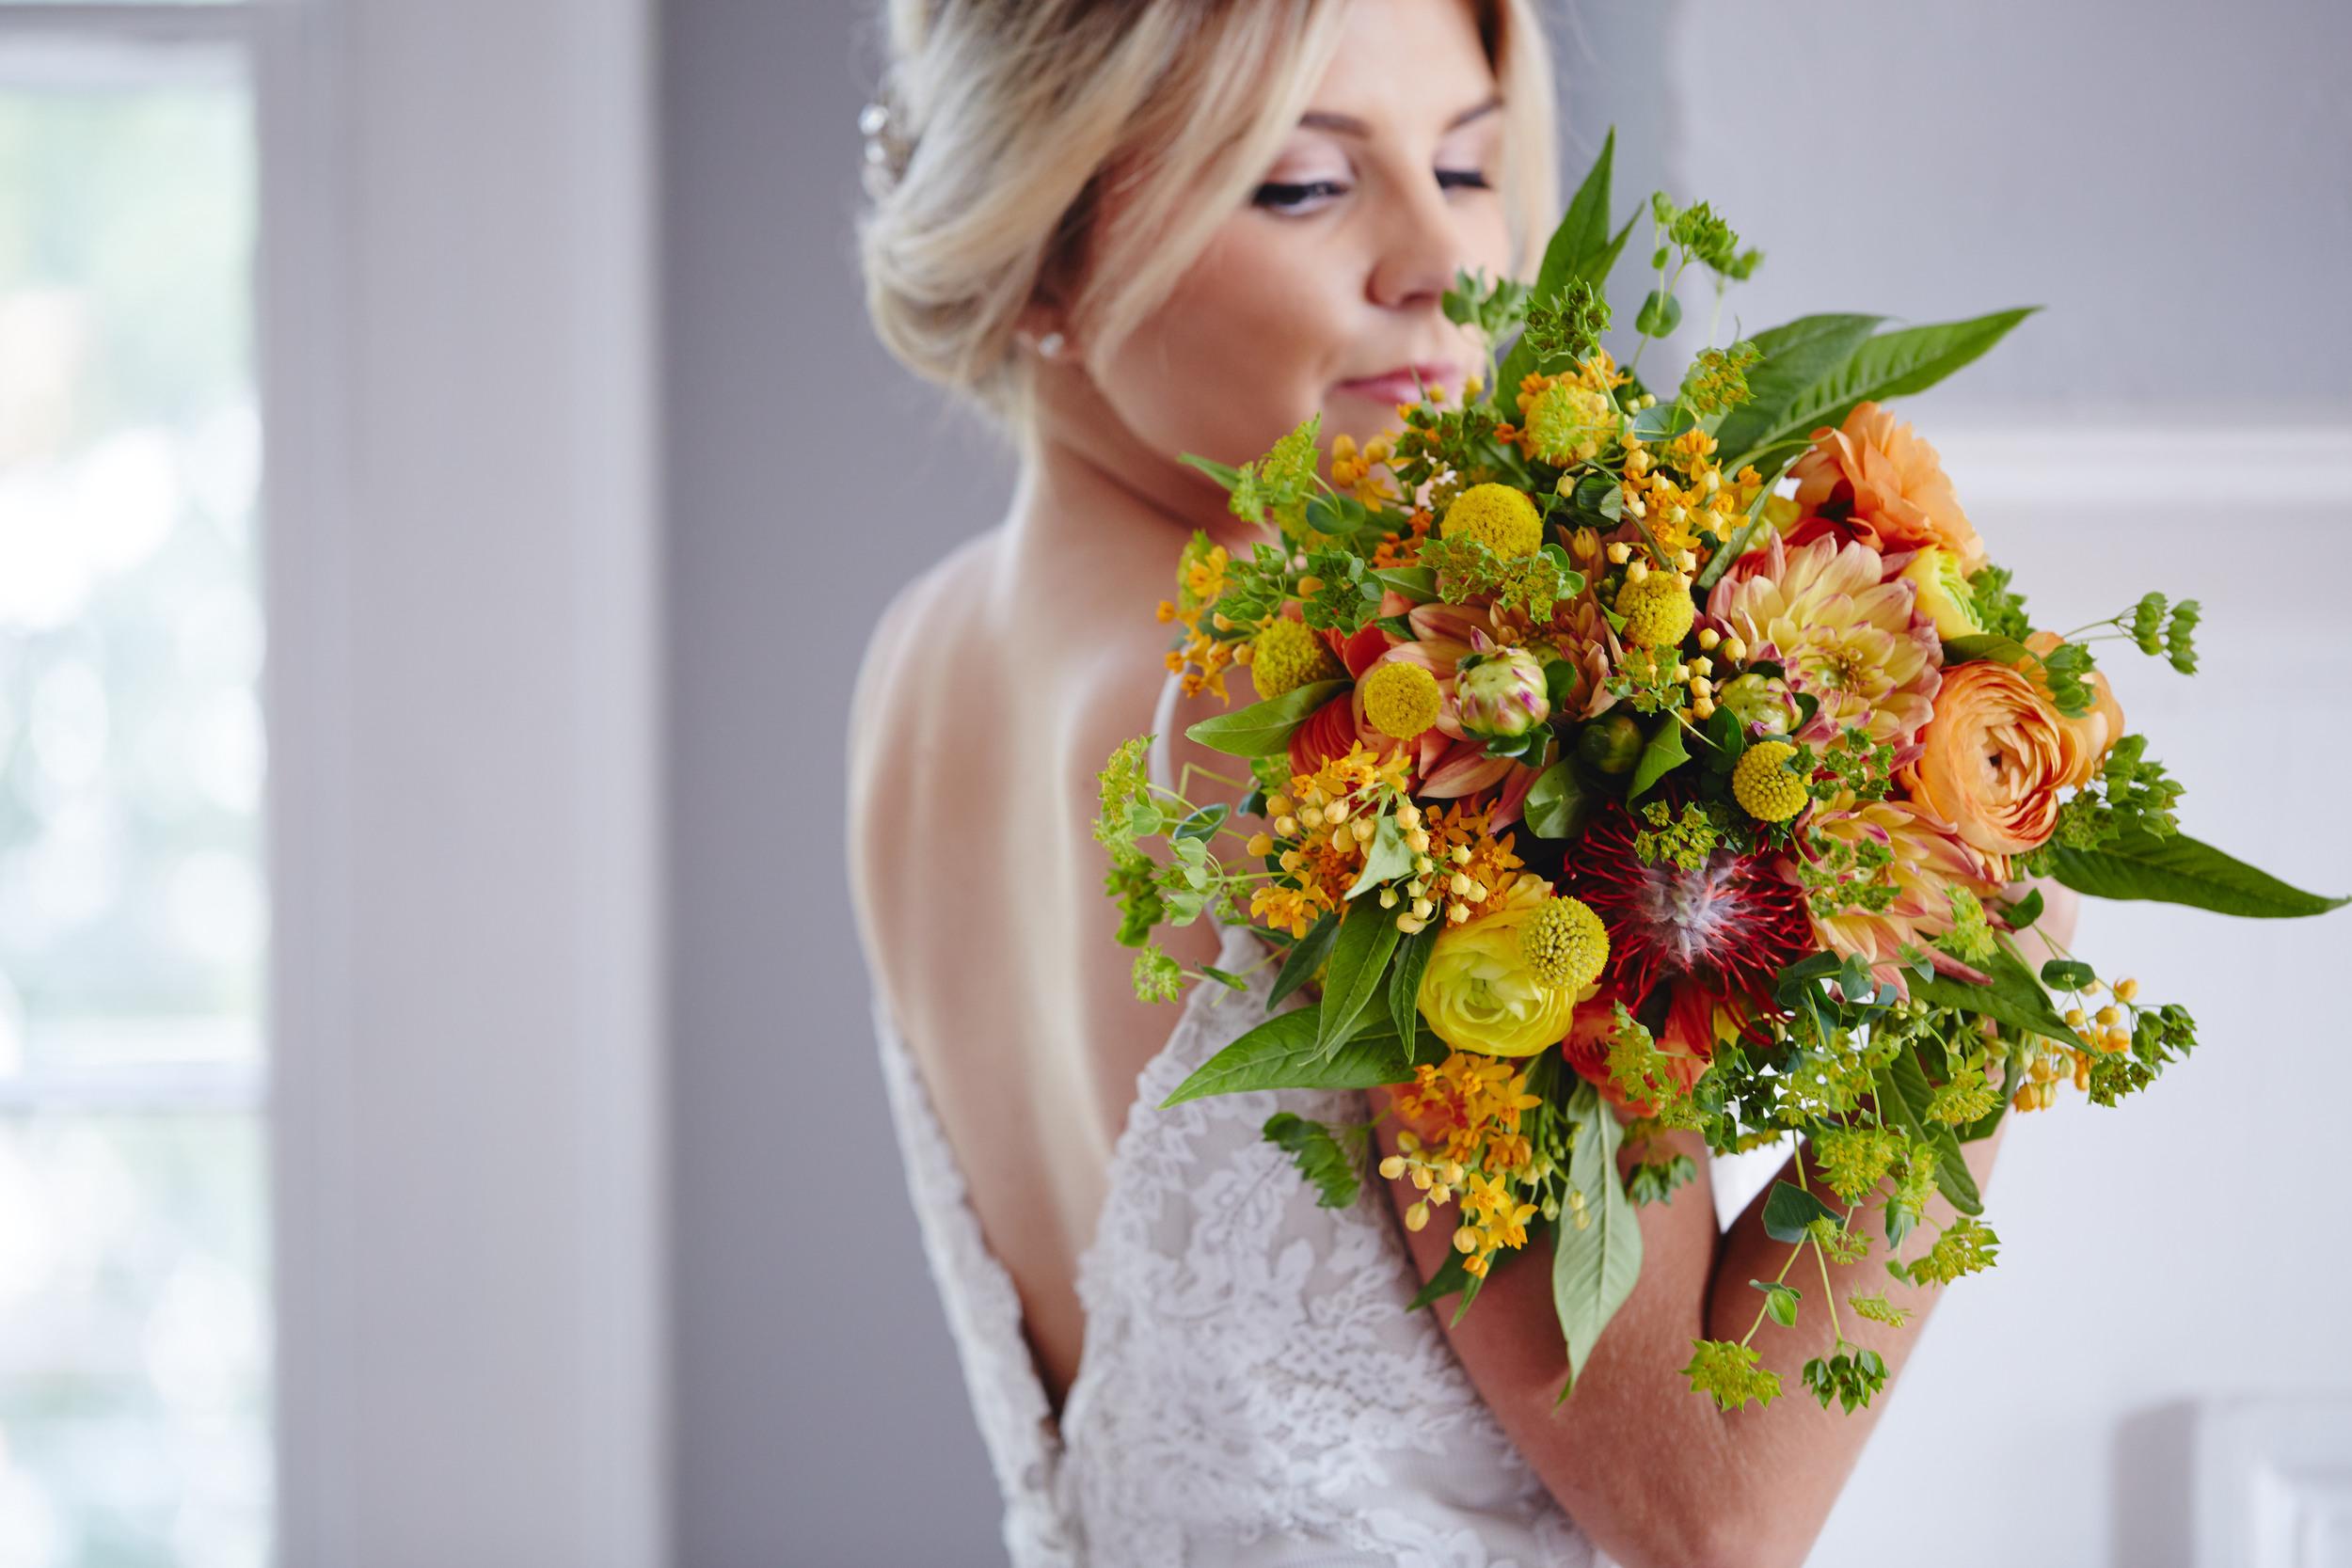 Styled_Session_Becca_Bridal_Portraits_Sarah_Tau_Photography_HOB_Studio_285.jpg